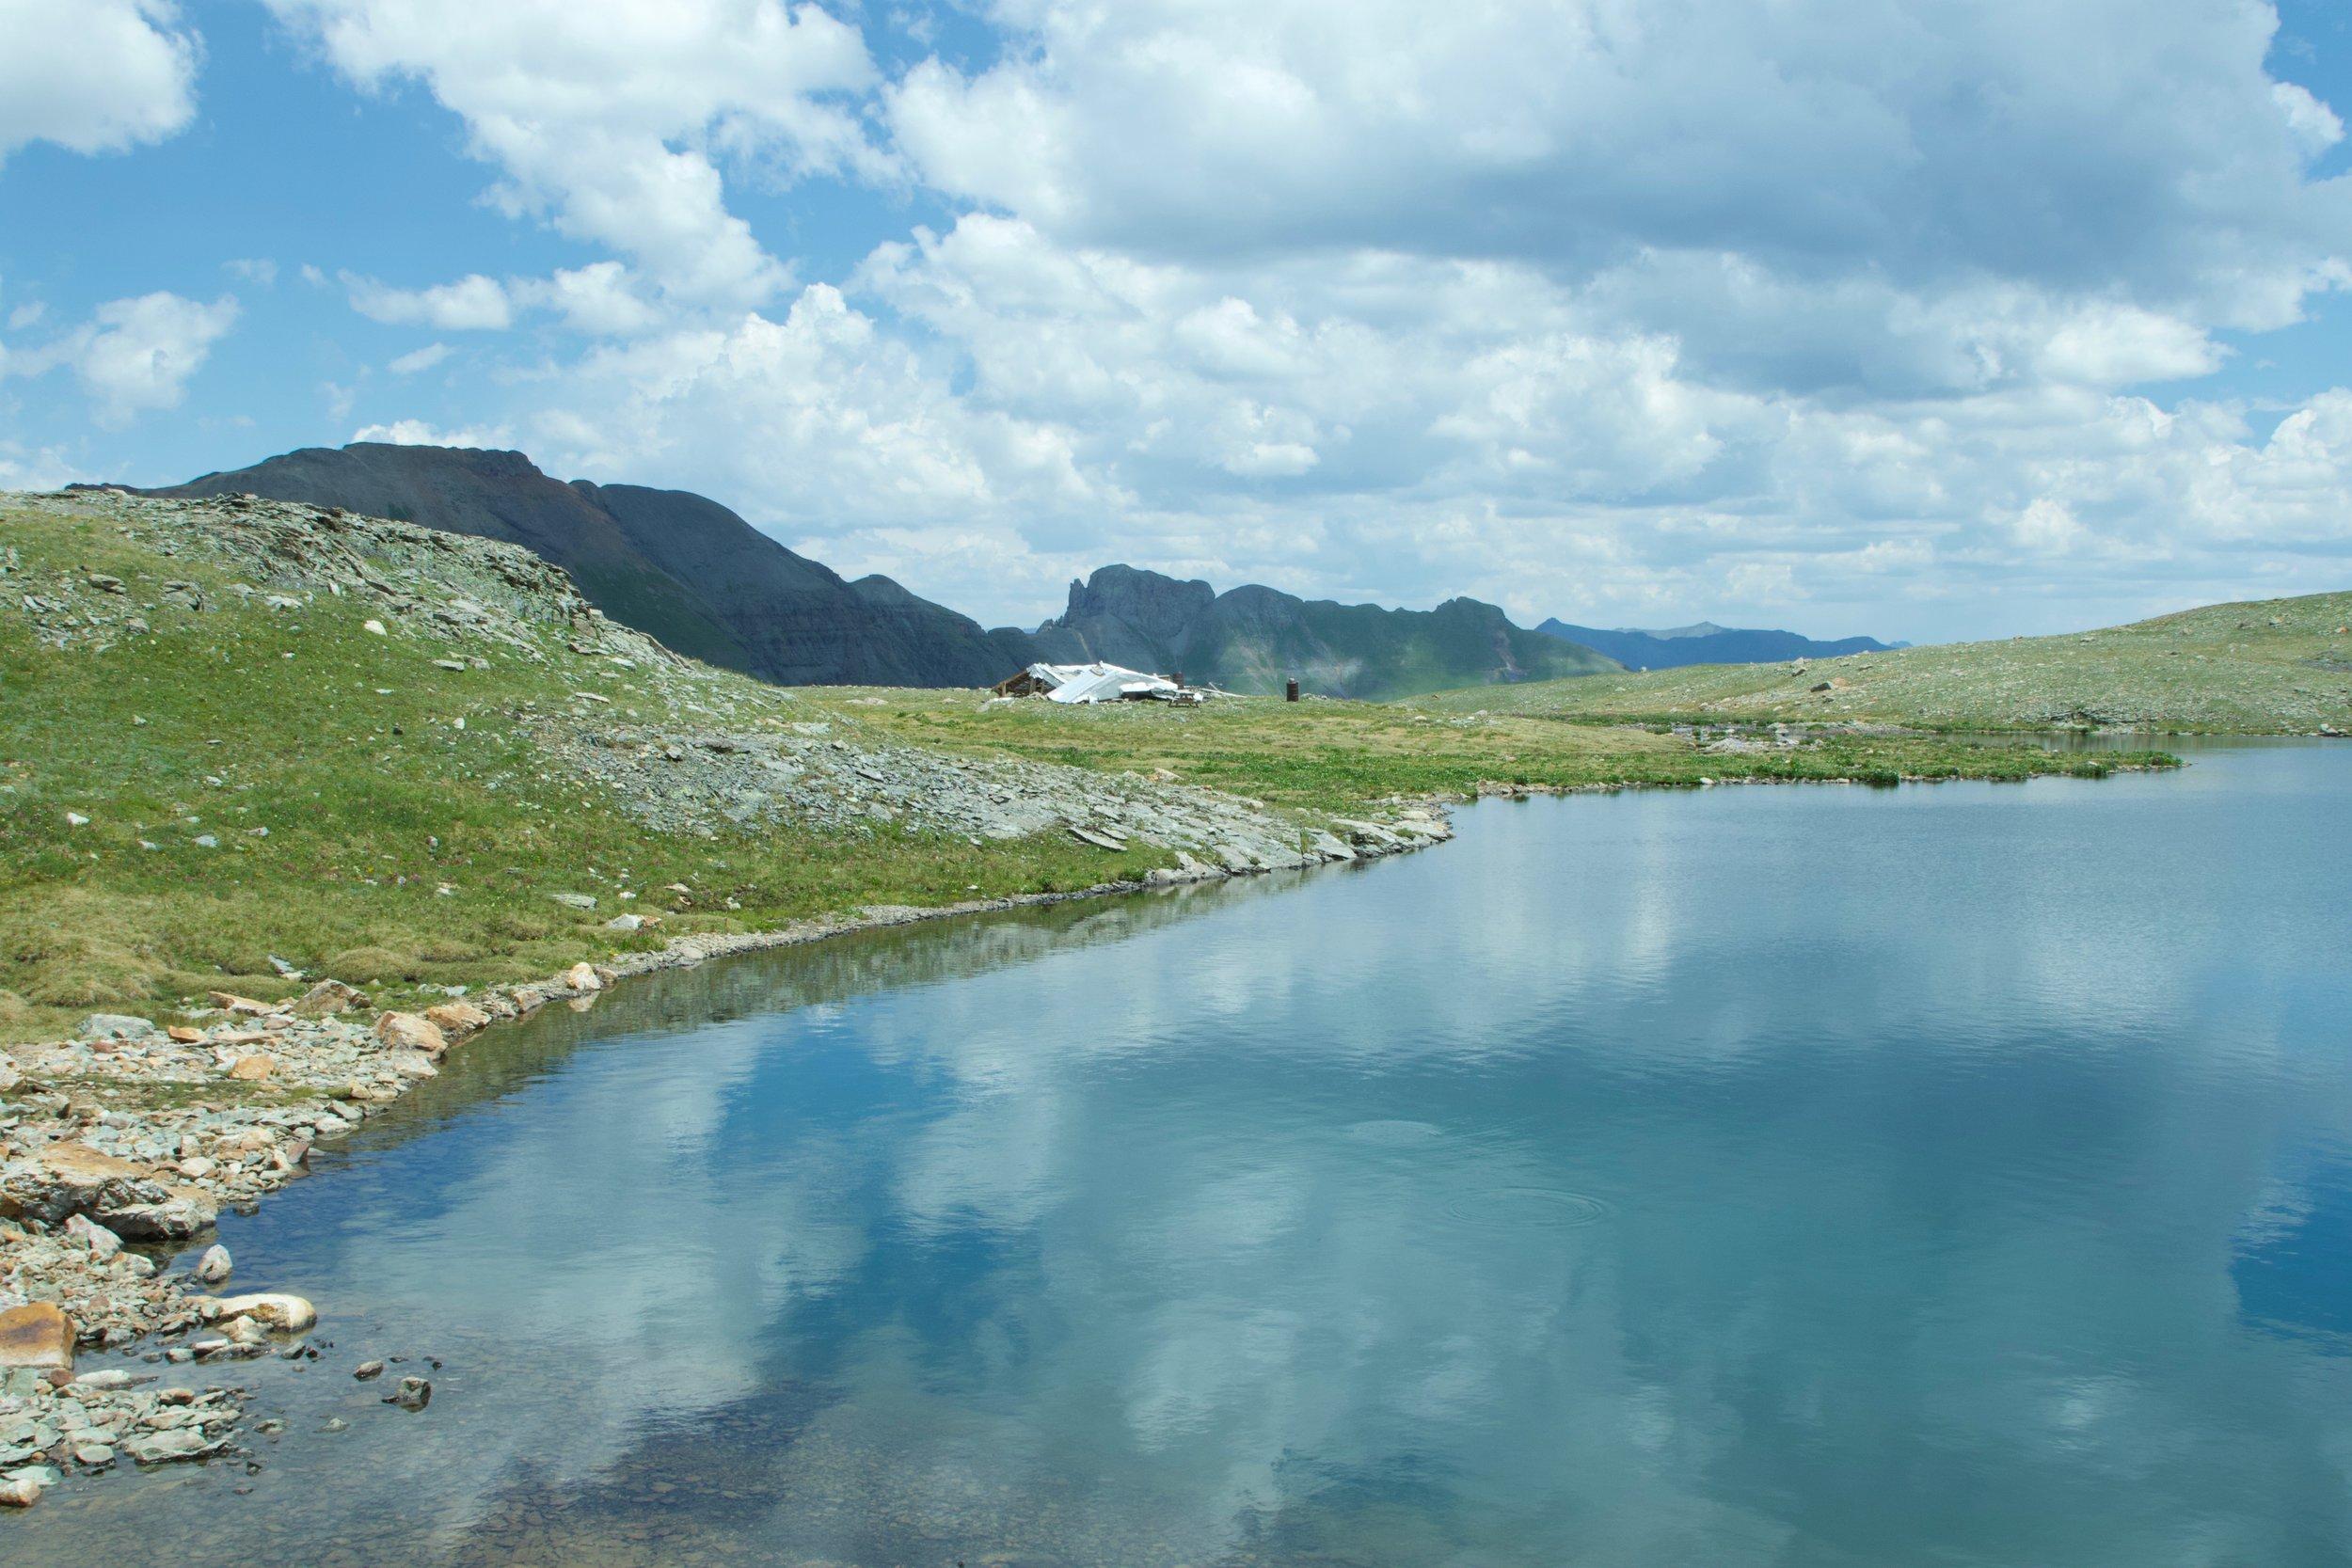 alpine lakes colorado rebecca mir grady